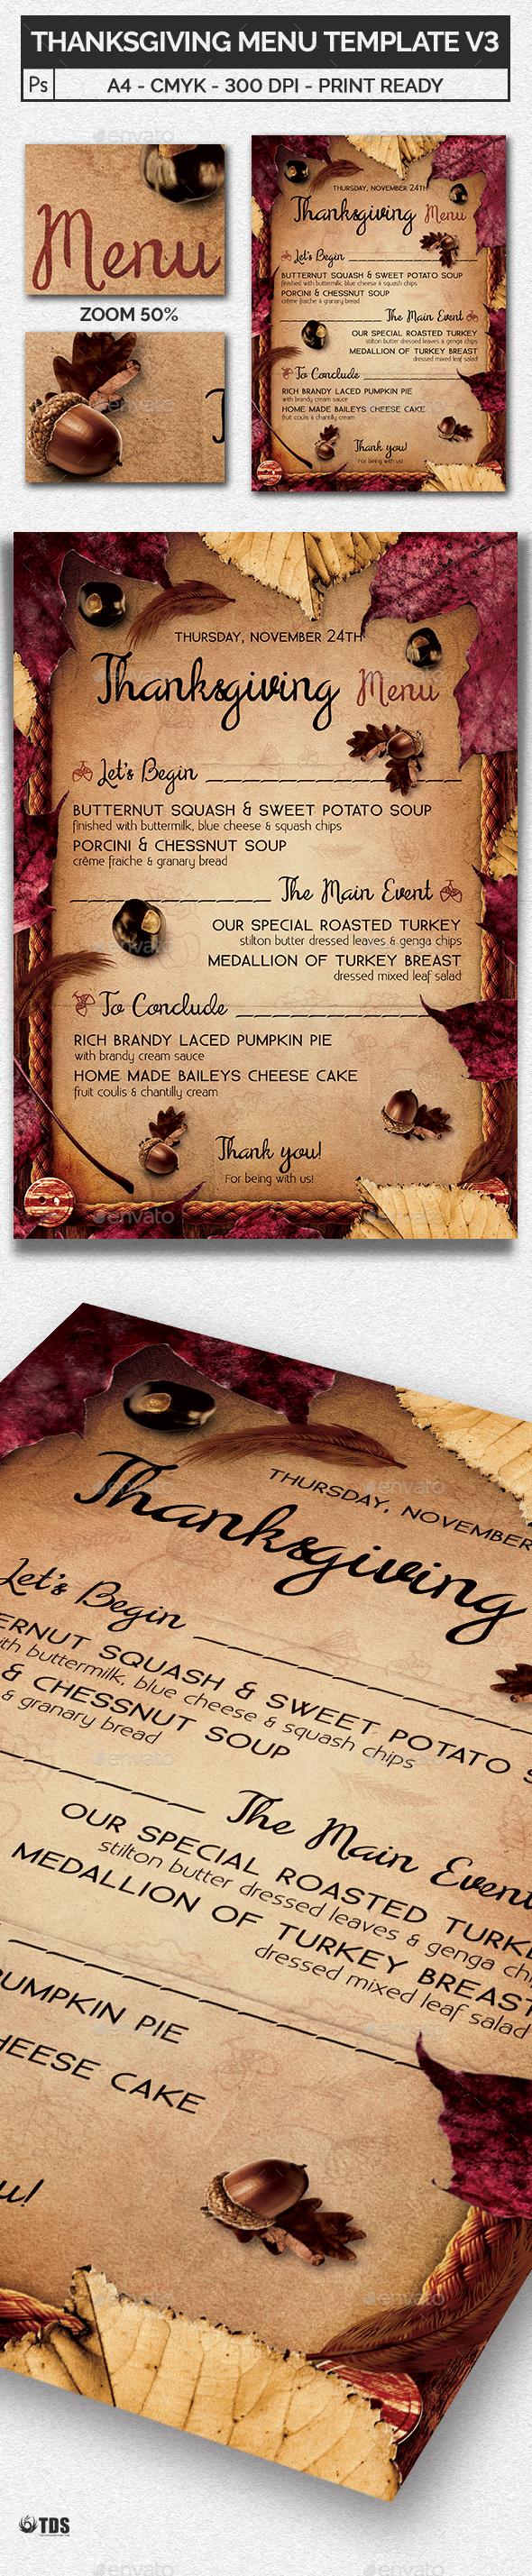 thanksgiving menu template v3 by lou606